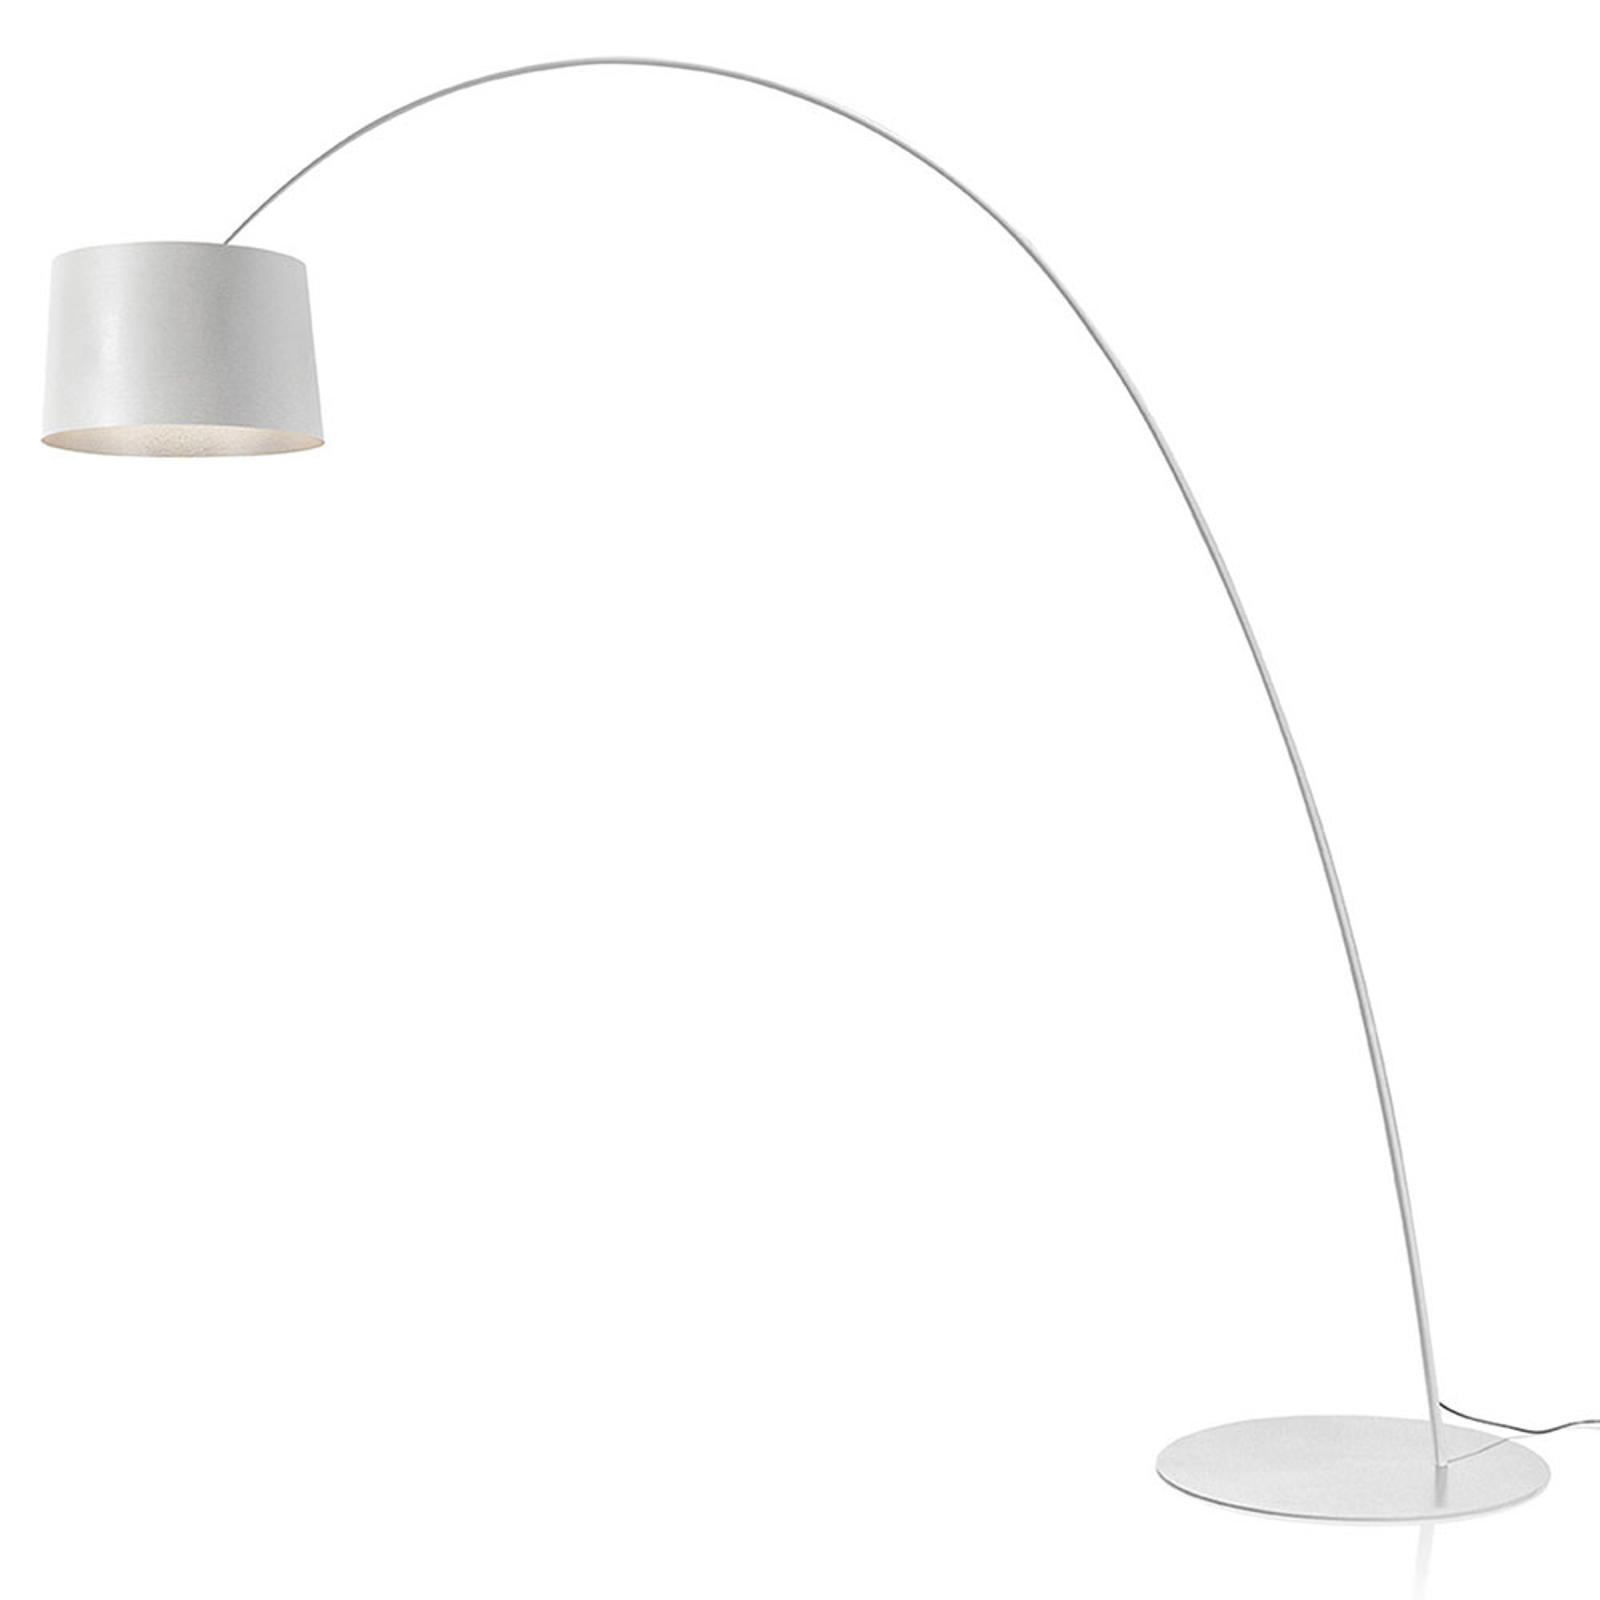 Foscarini Twiggy Elle MyLight Stehlampe CCT weiß